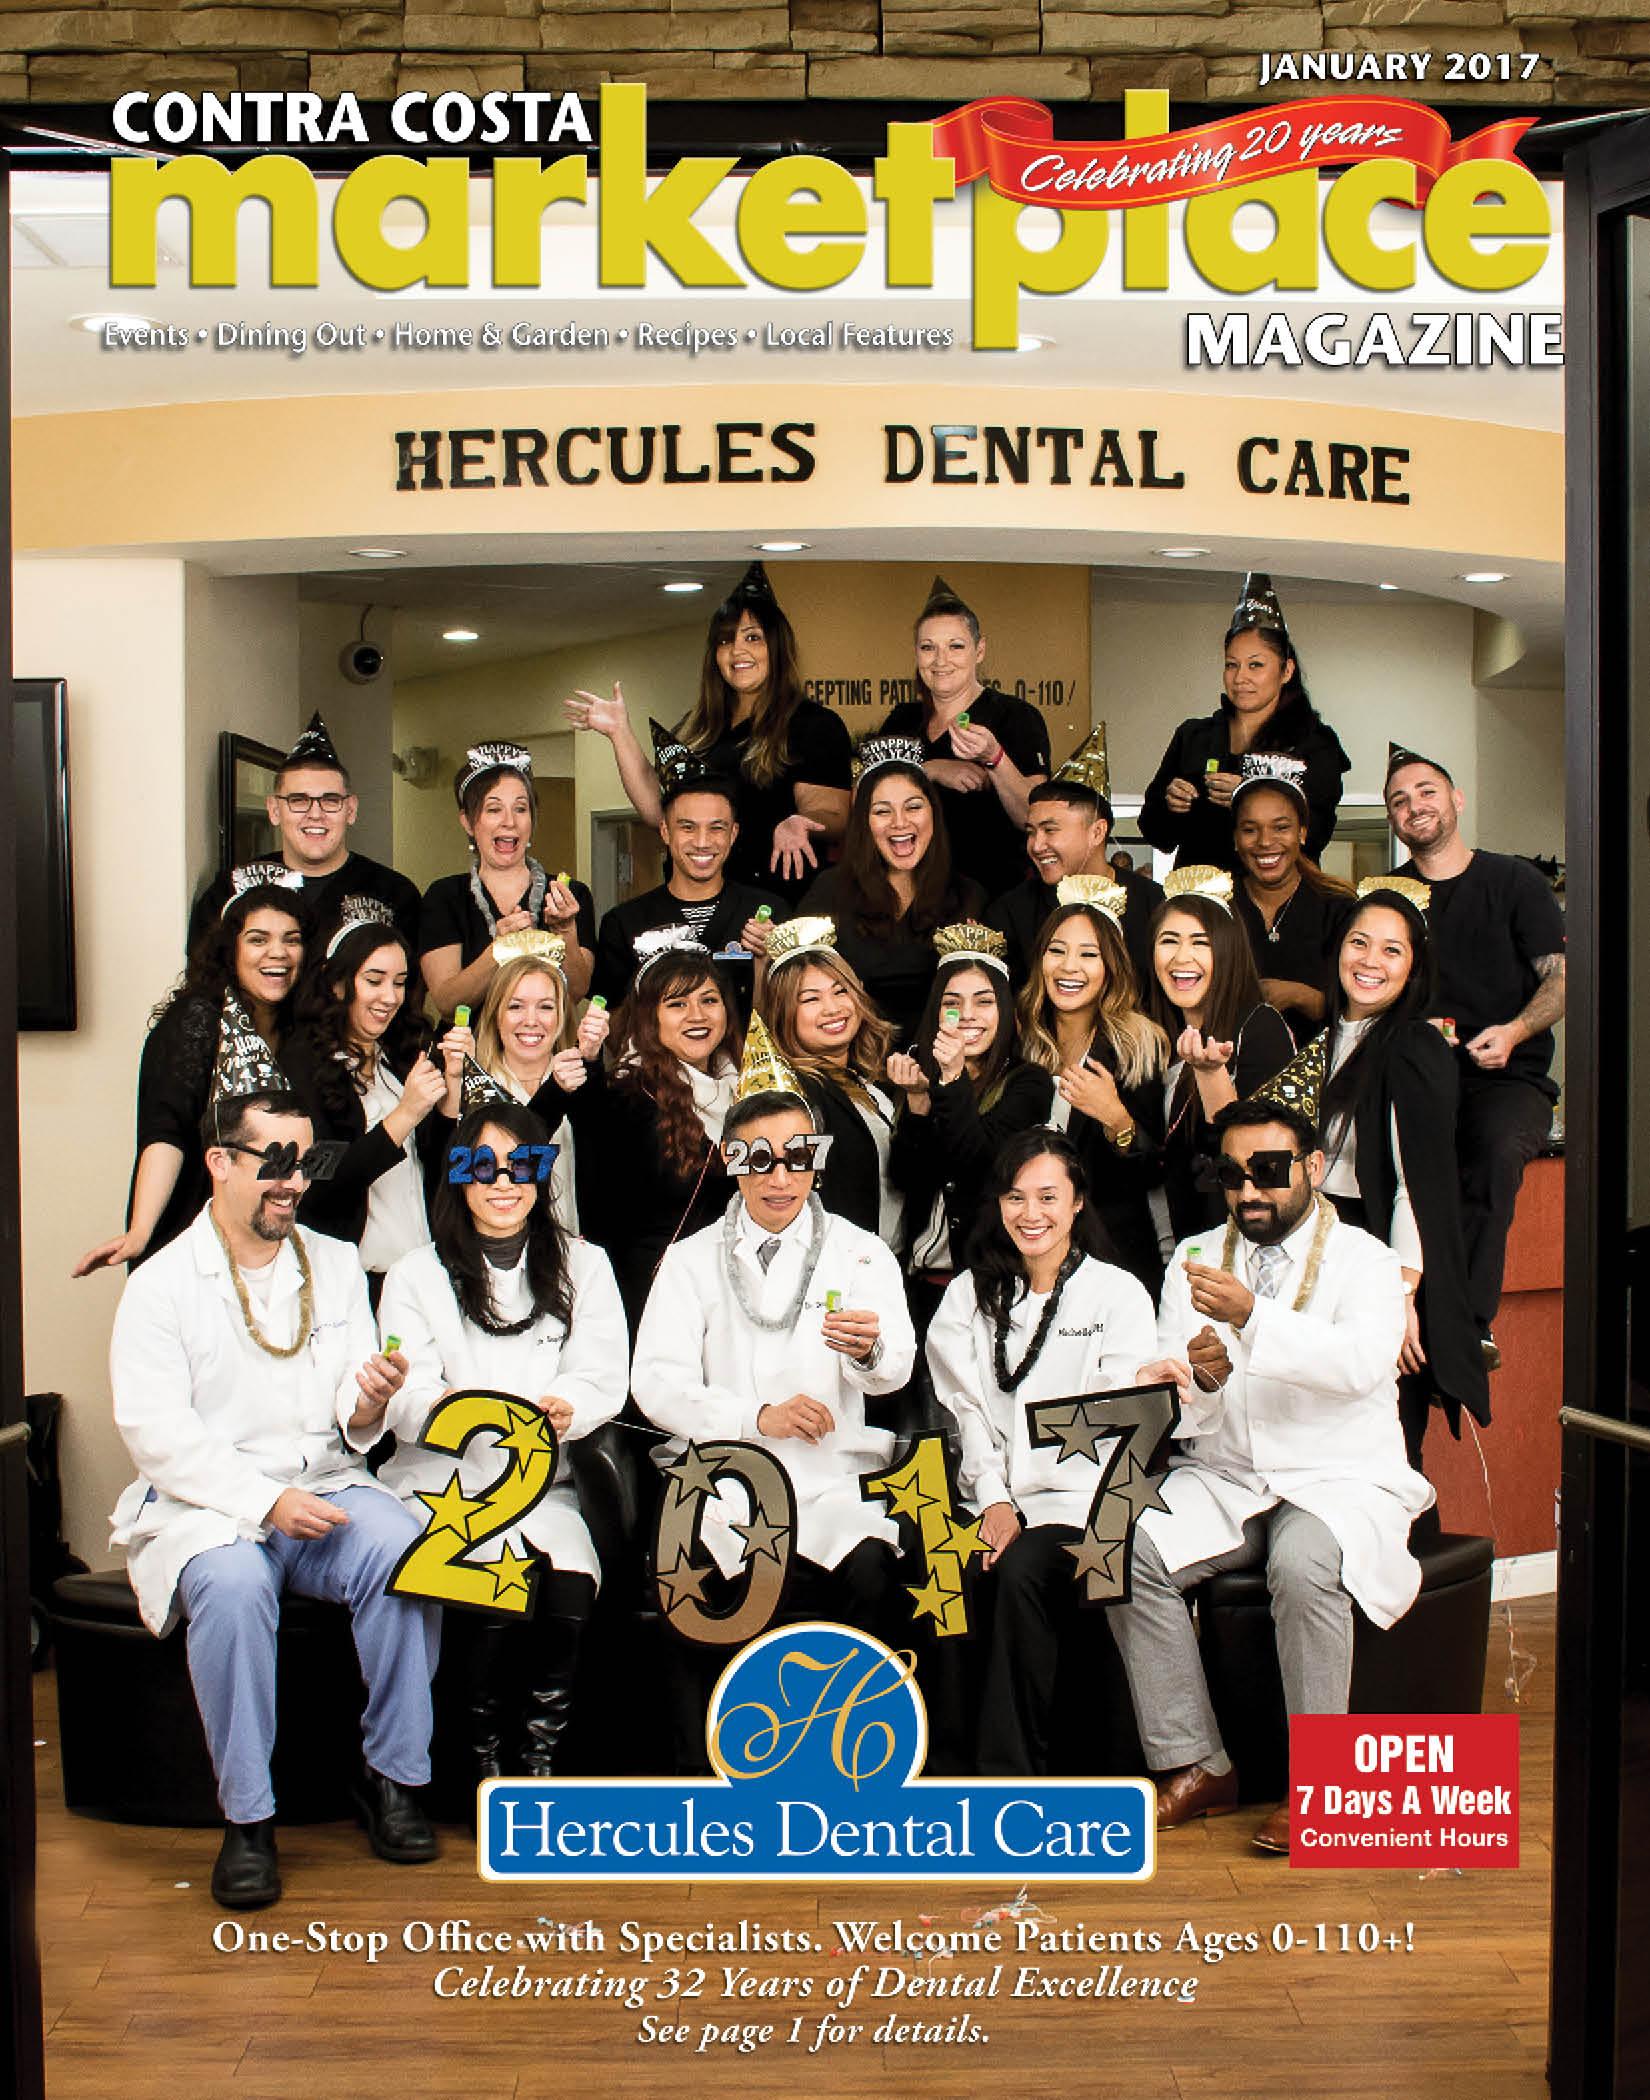 CC Cover Herc Dental 0117HR